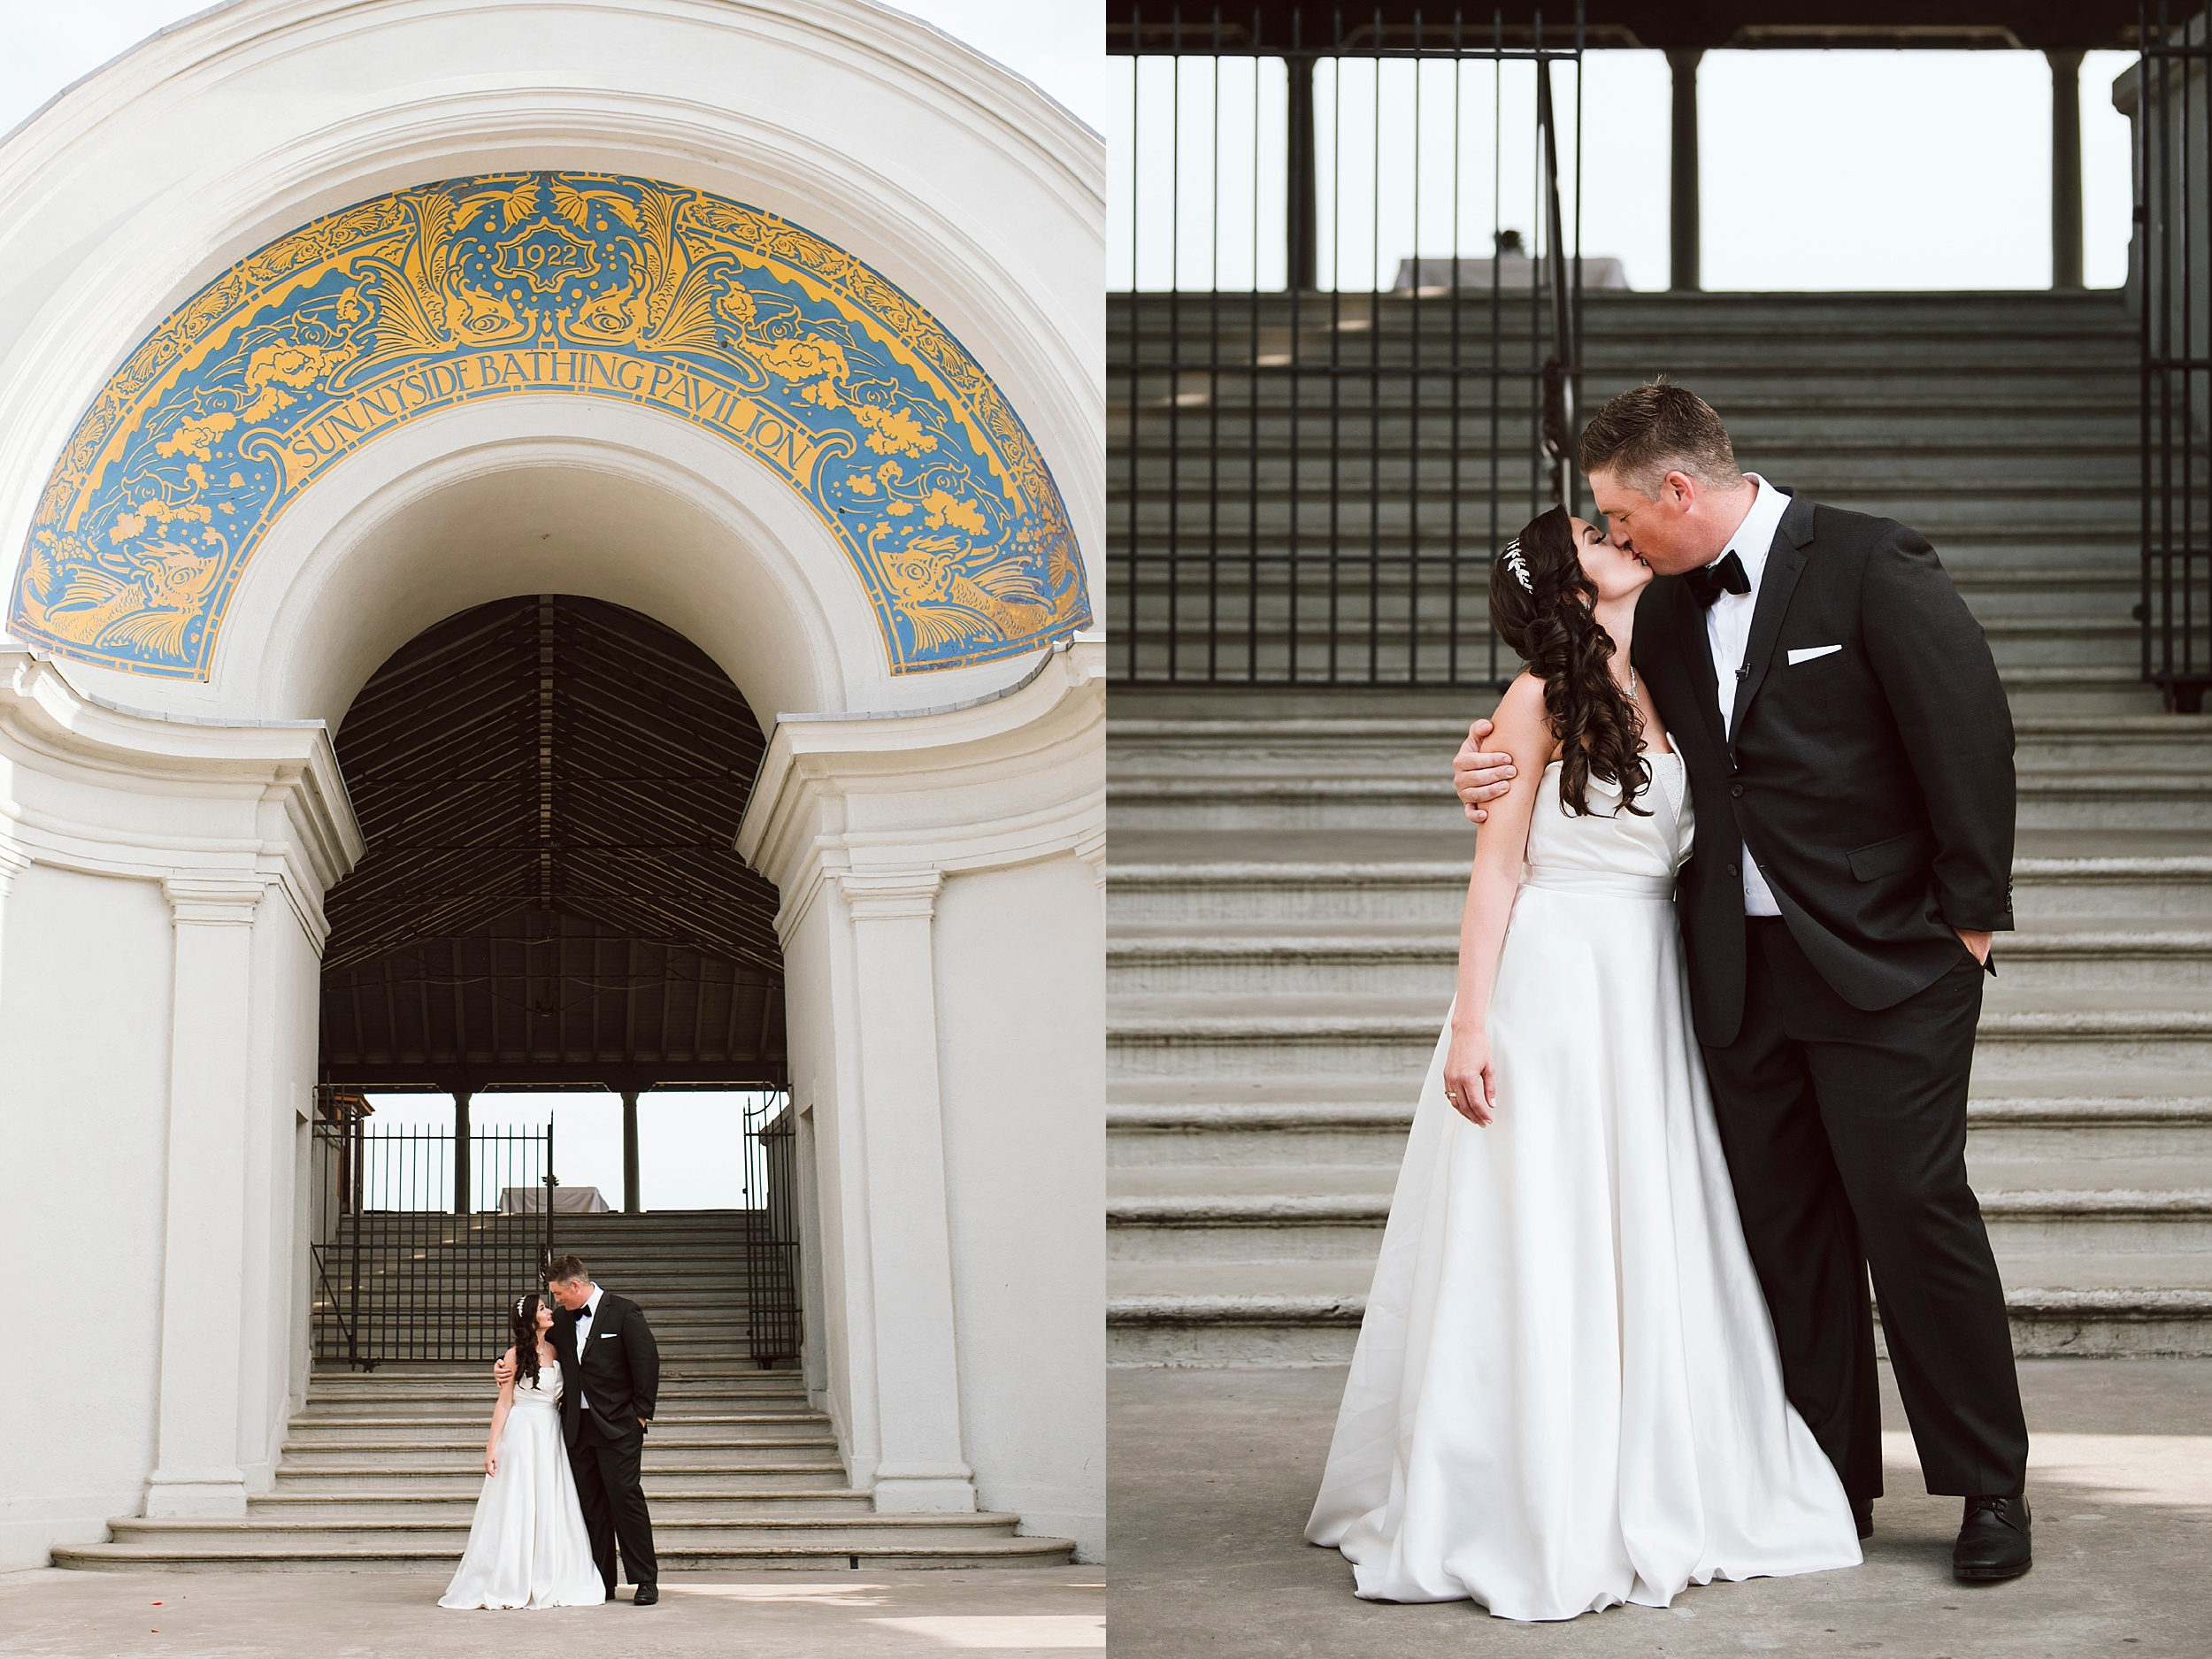 Sunnyside_Pavilion_Wedding_Toronto_Photographer_0052.jpg